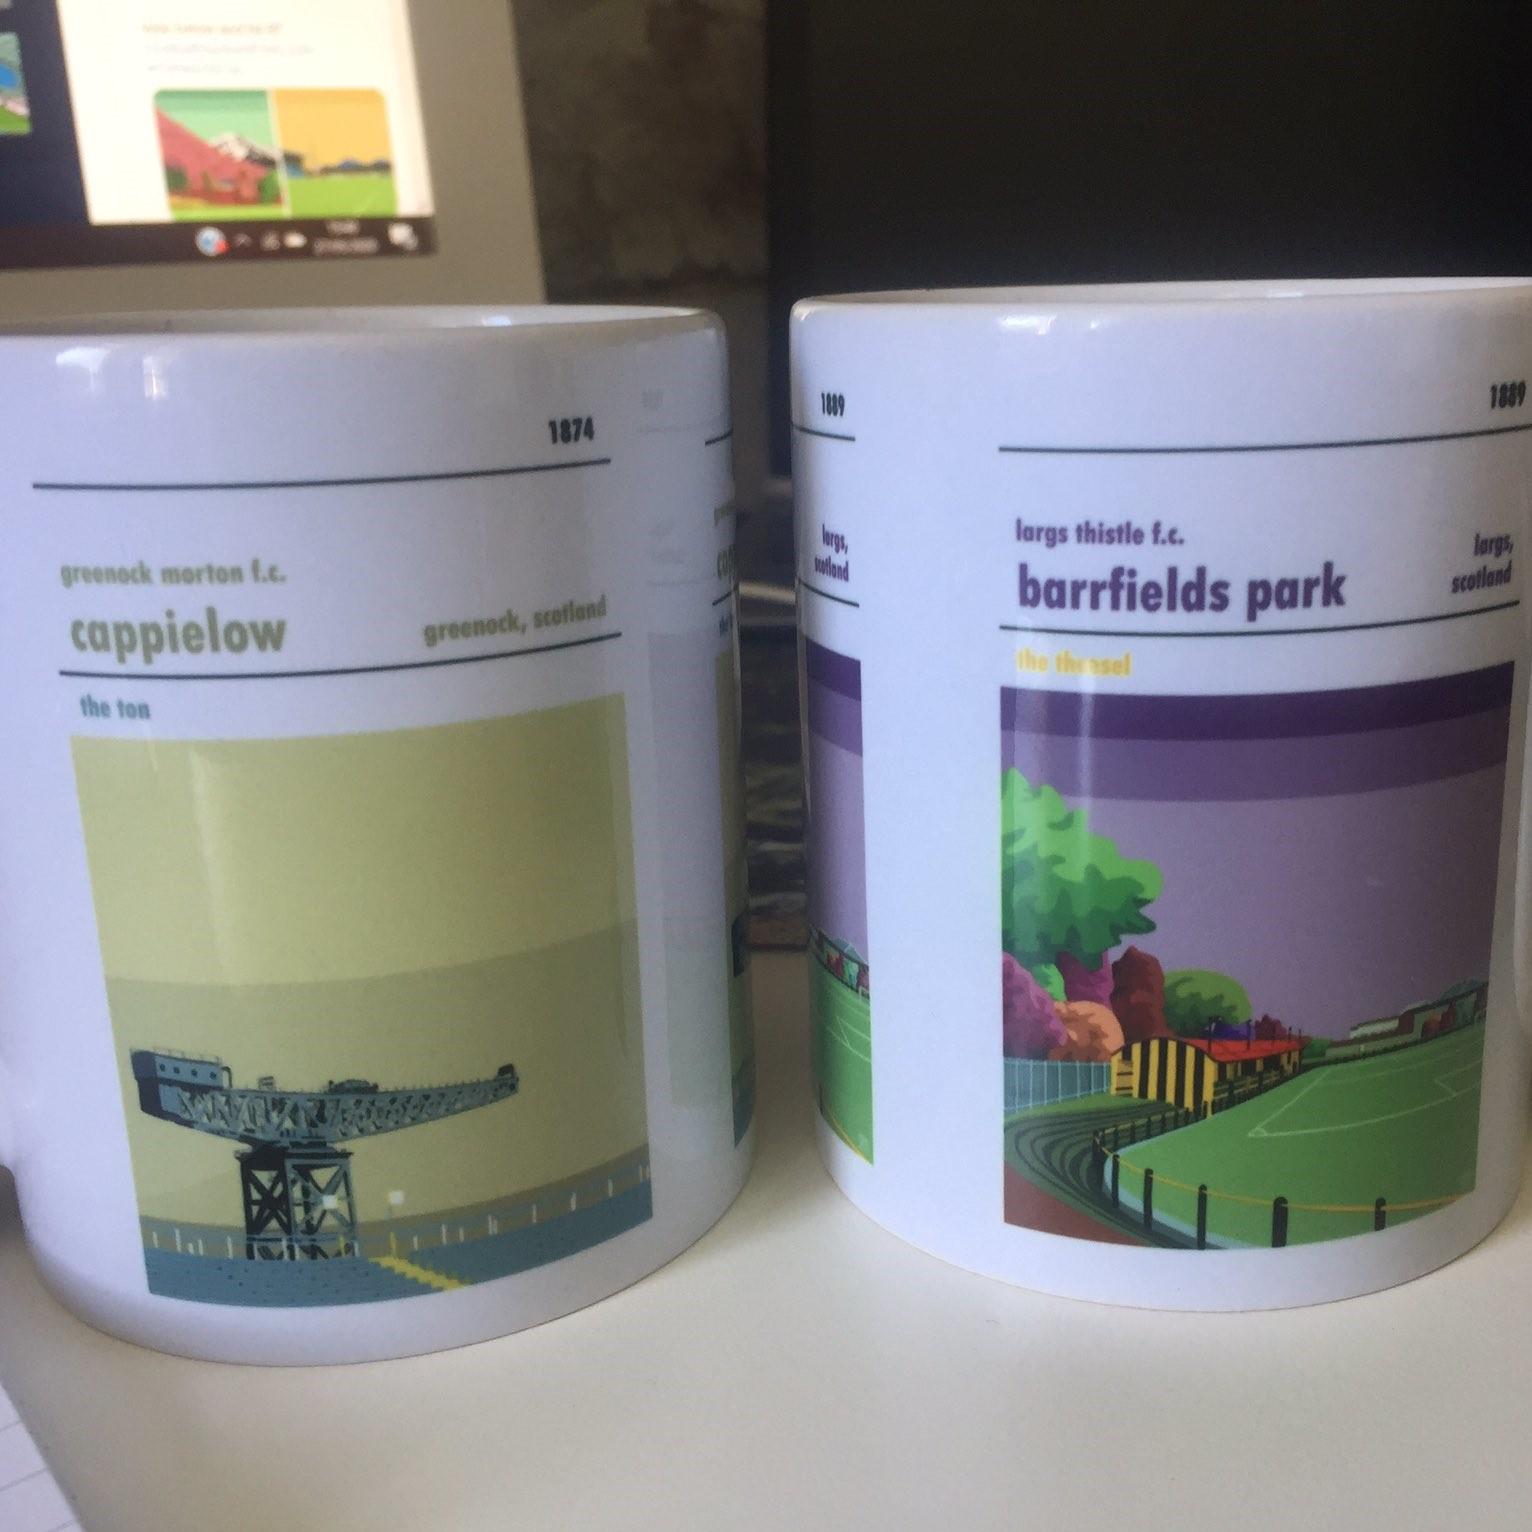 Greenock Morton and Largs United coffee mugs